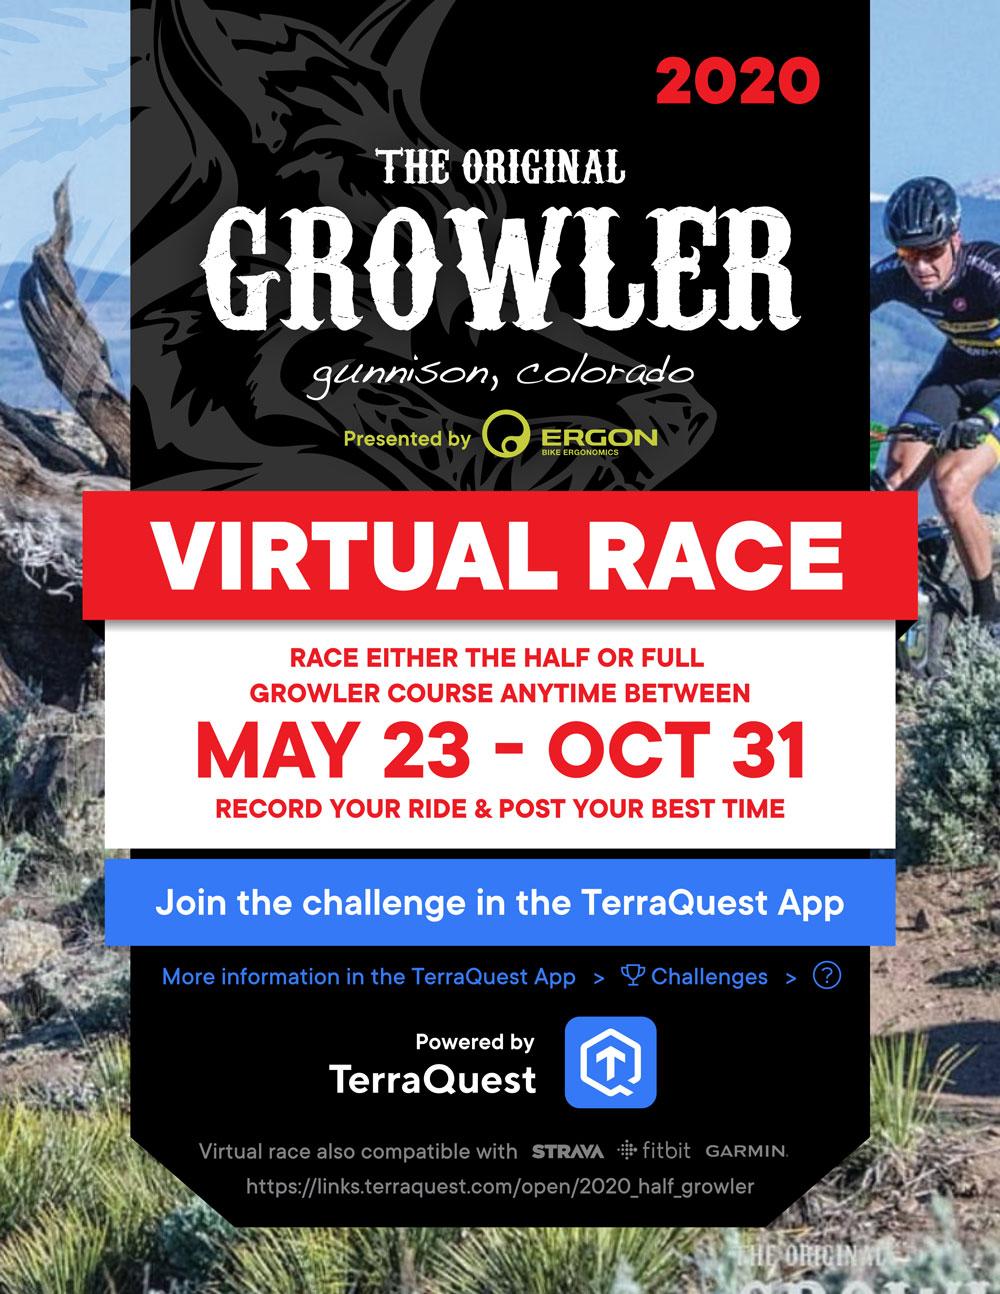 Growler goes Virtual